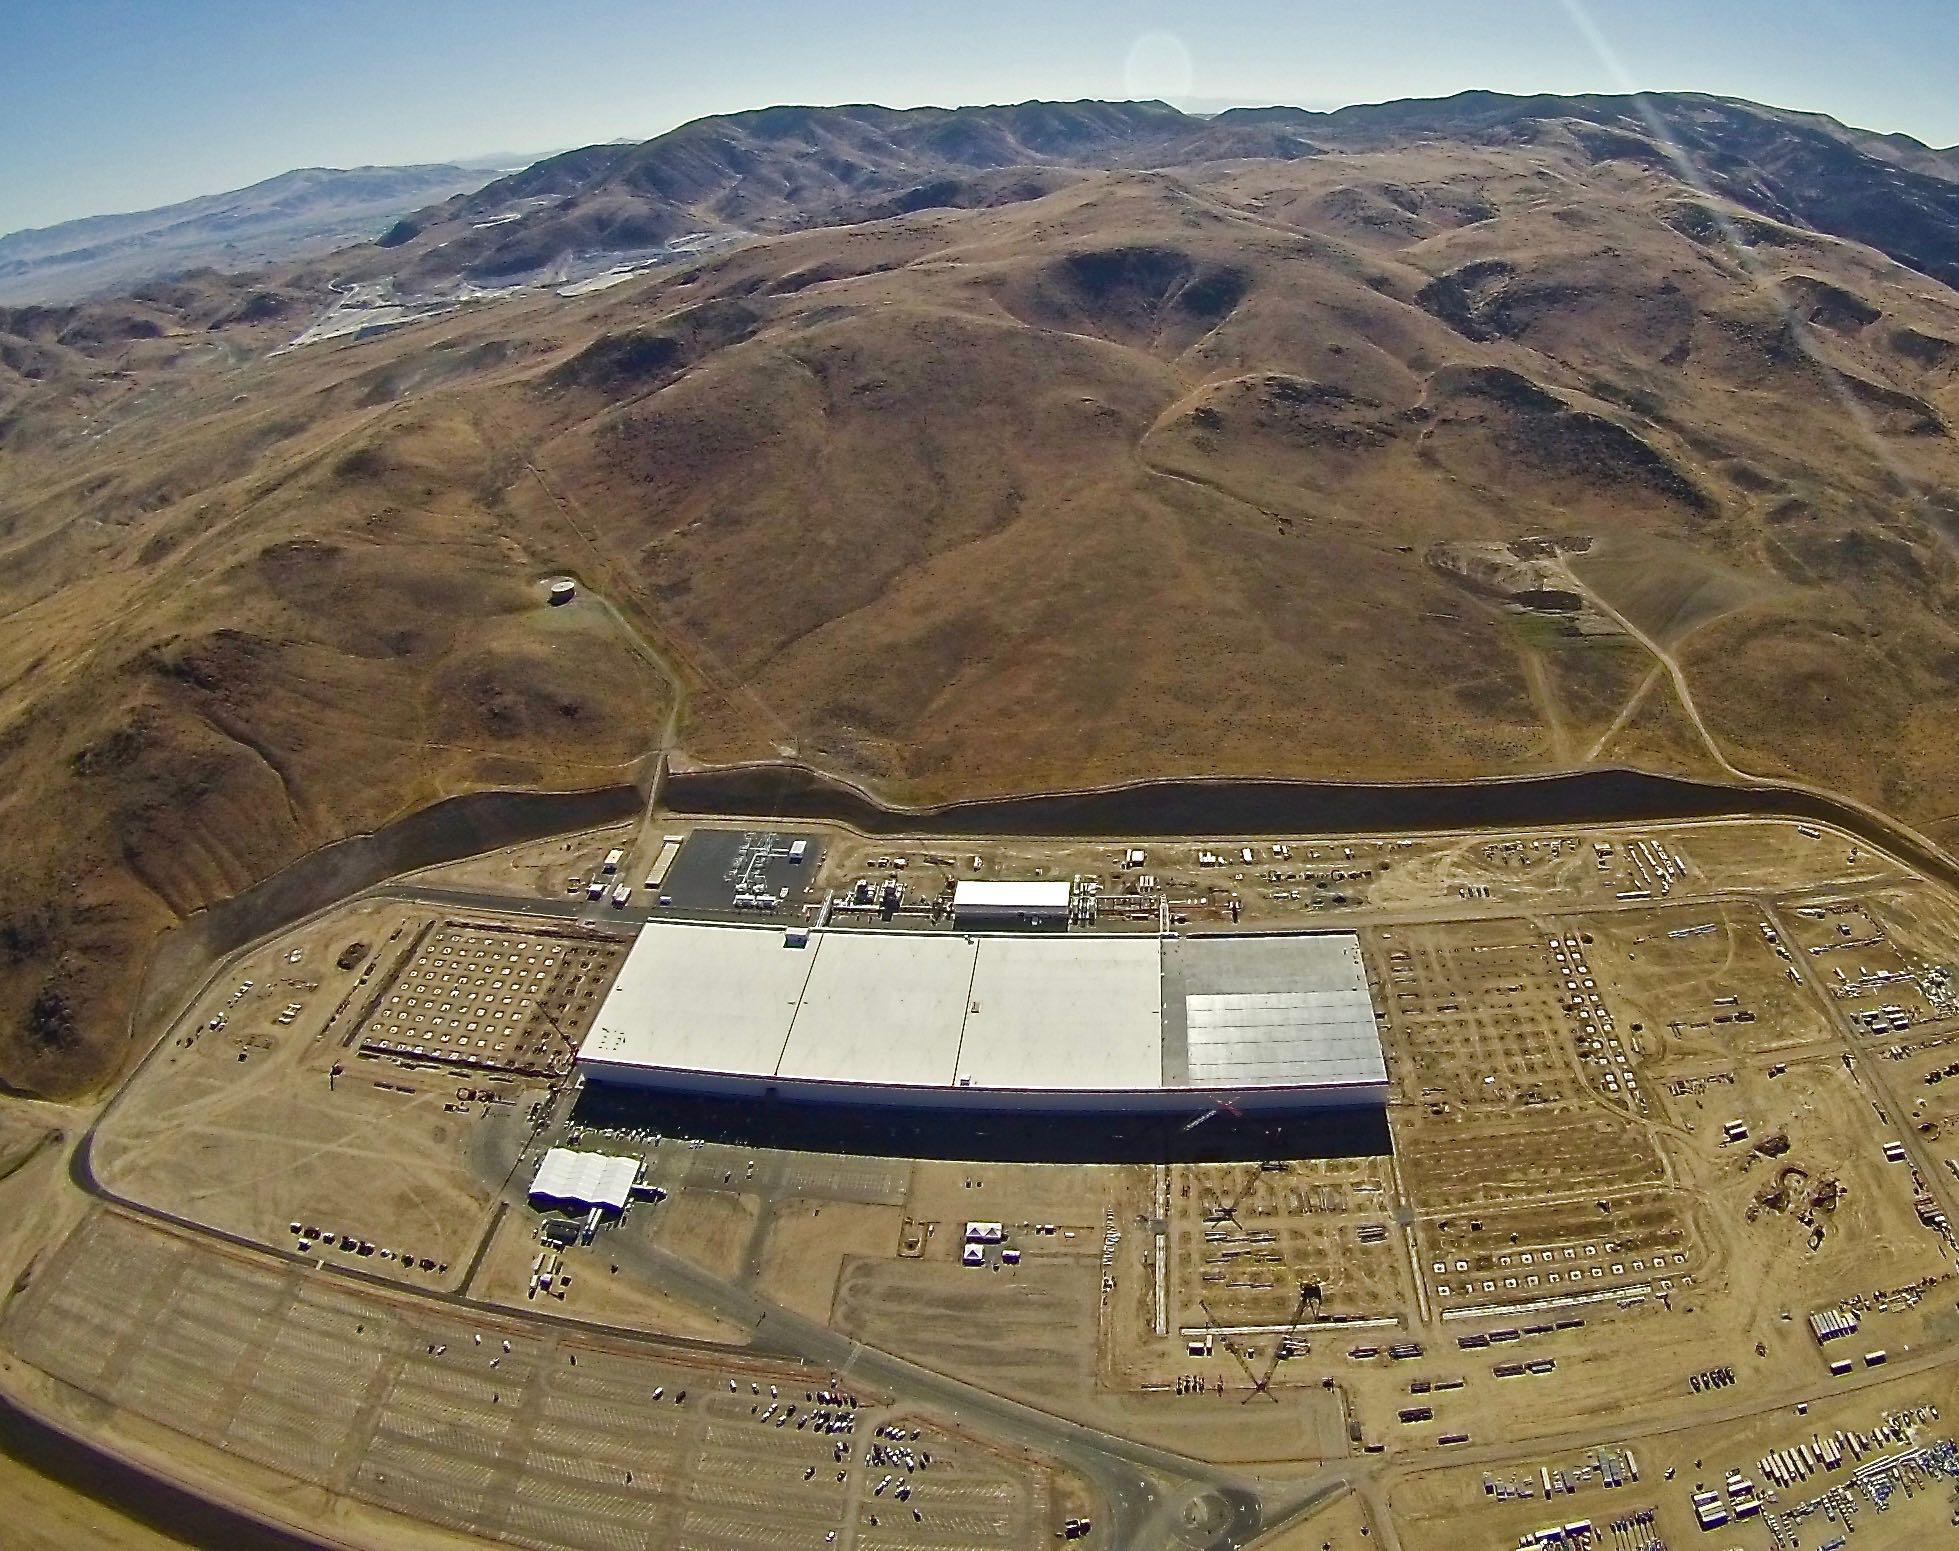 Tesla Gigafactory event prepartions seen in aerial photo taken July 24, 2016